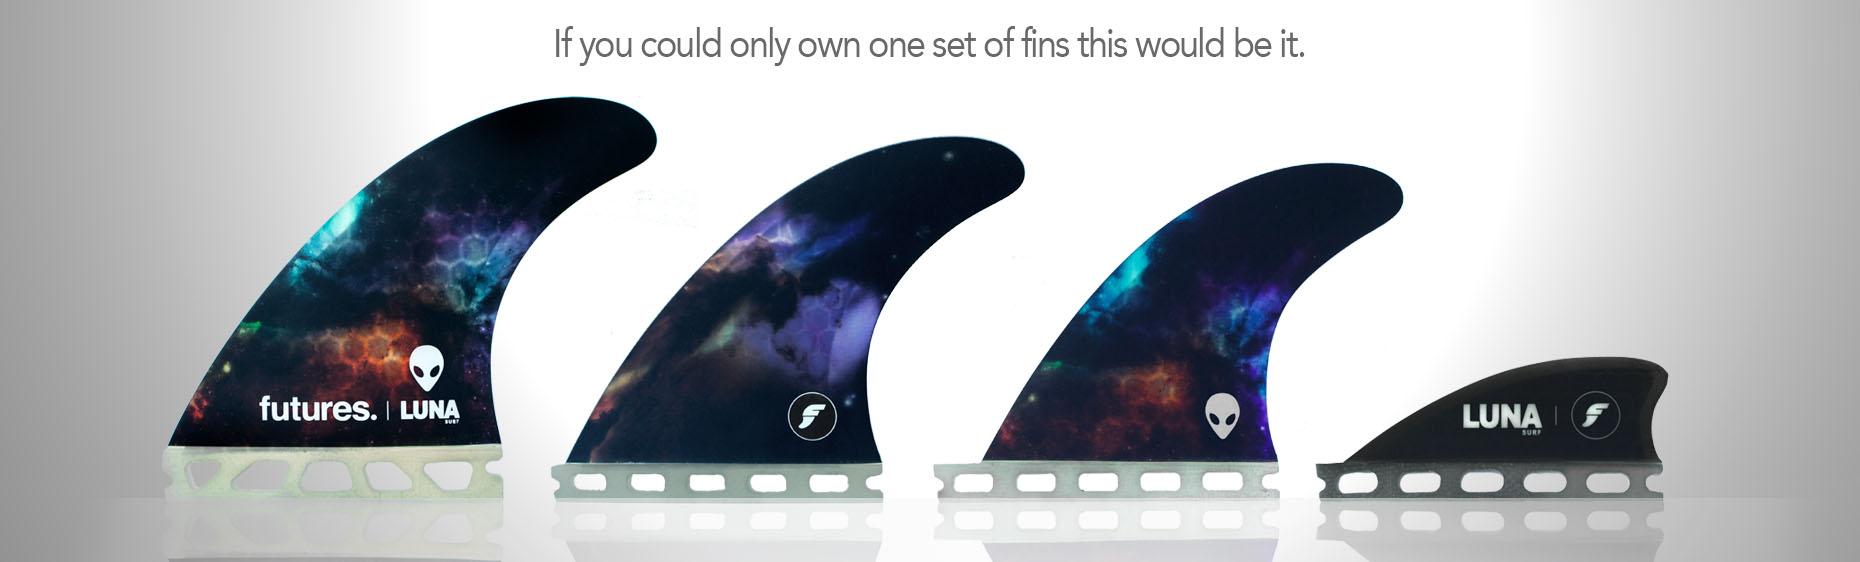 Lunasurf Futures fins